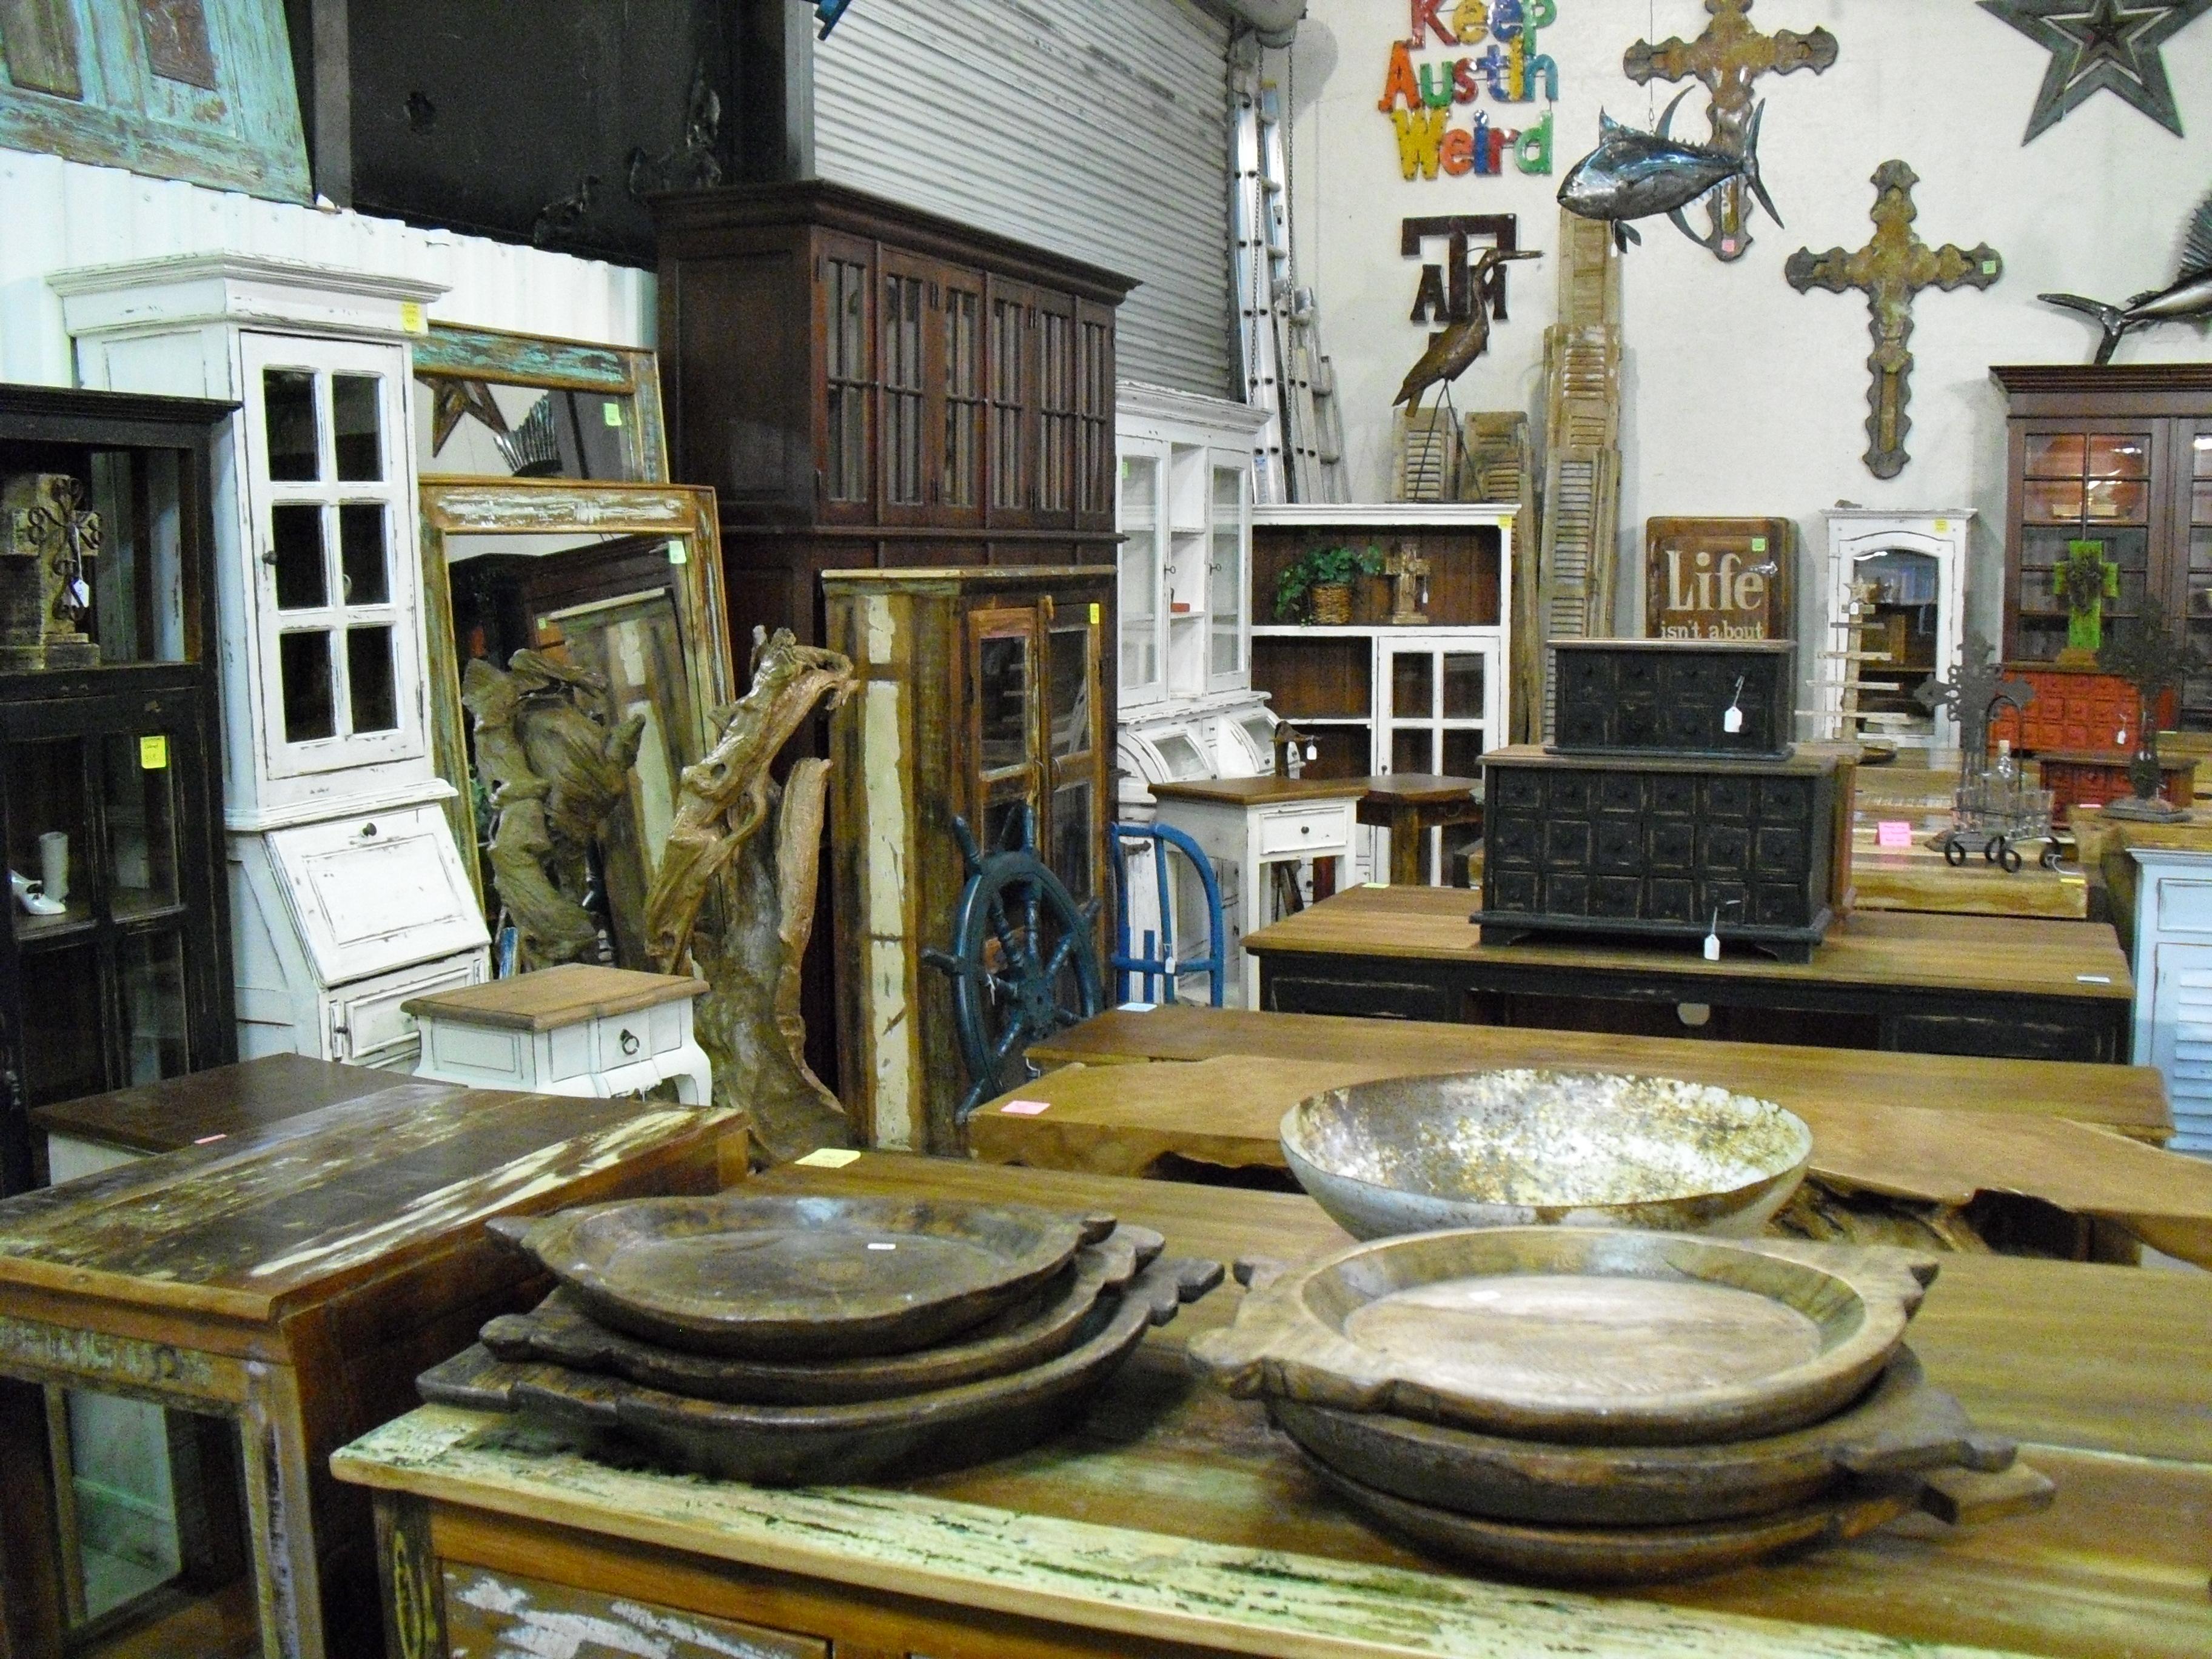 Mister Roberts Furniture Conroe TX wwwmisterrobertsfurniture